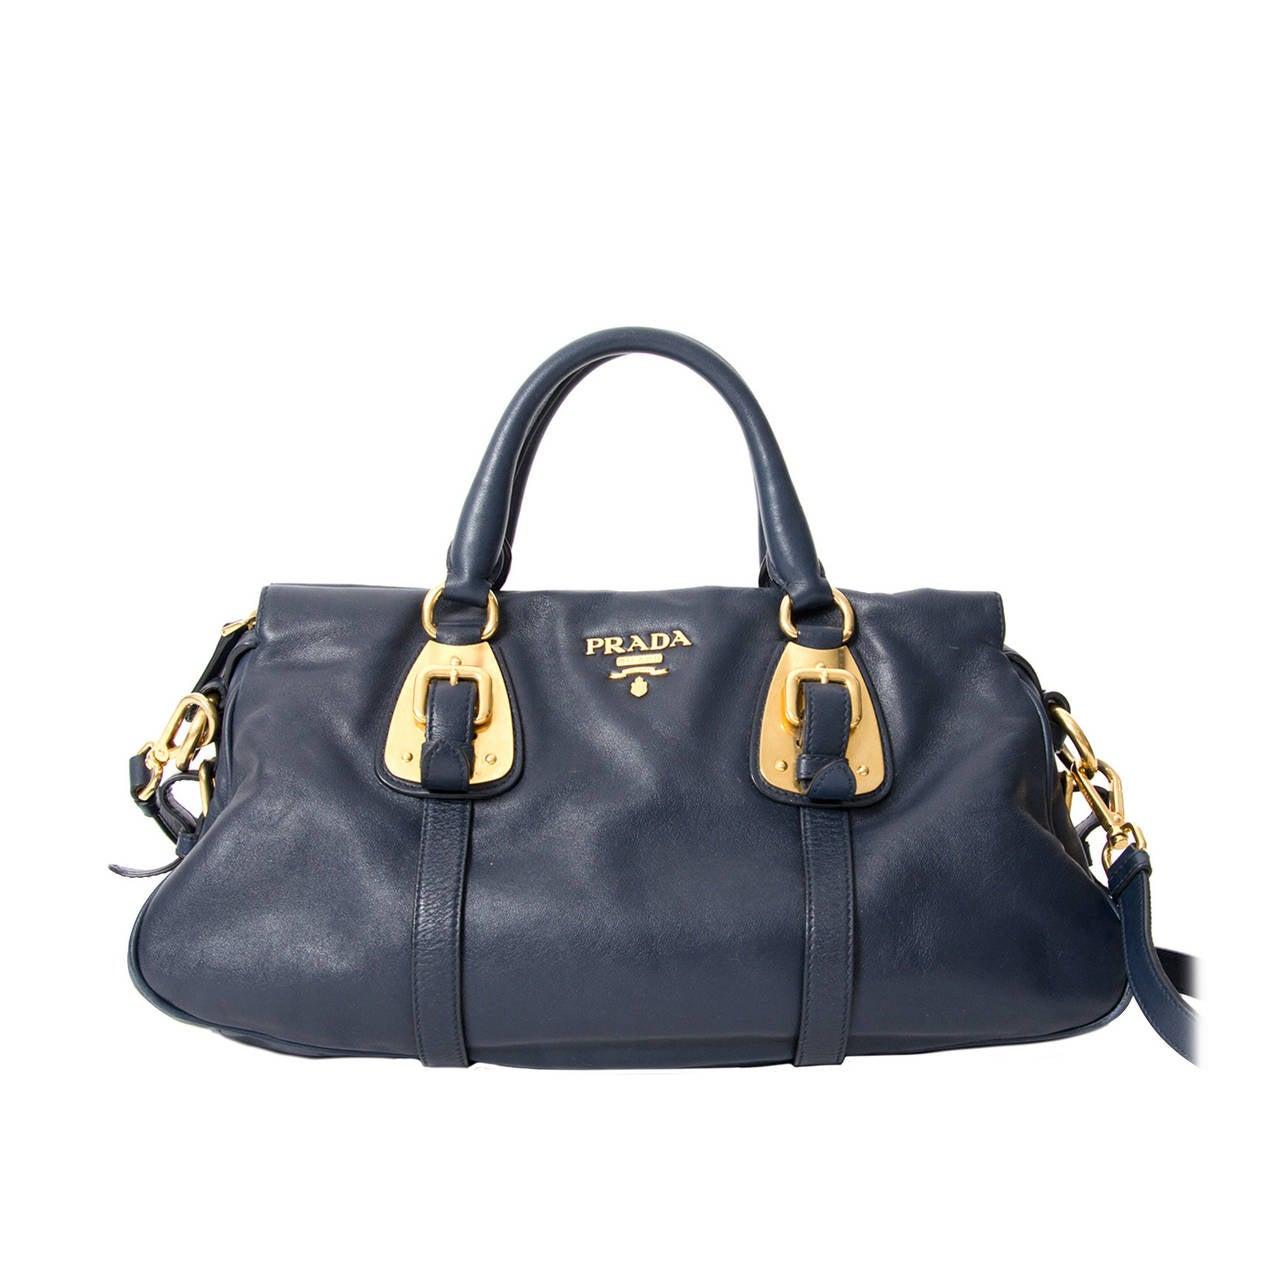 Prada Bag Navy